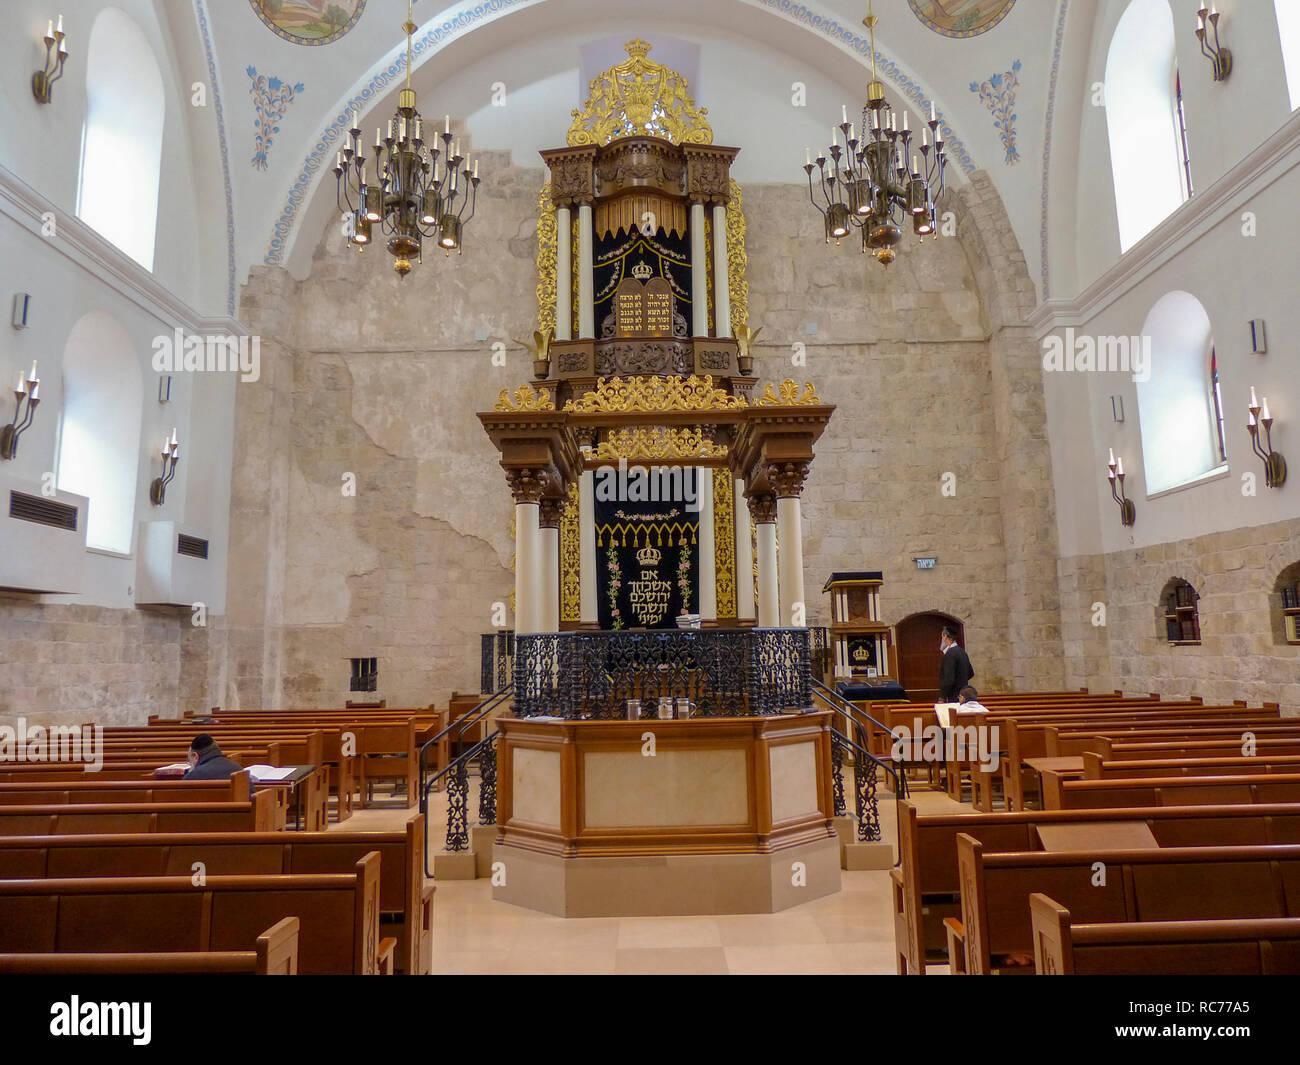 "The Hurva Synagogue, (""The Ruin Synagogue""), also known as Hurvat Rabbi Yehudah he-Hasid (""Ruin of Rabbi Judah the Pious""), is a historic synagogue lo Stock Photo"